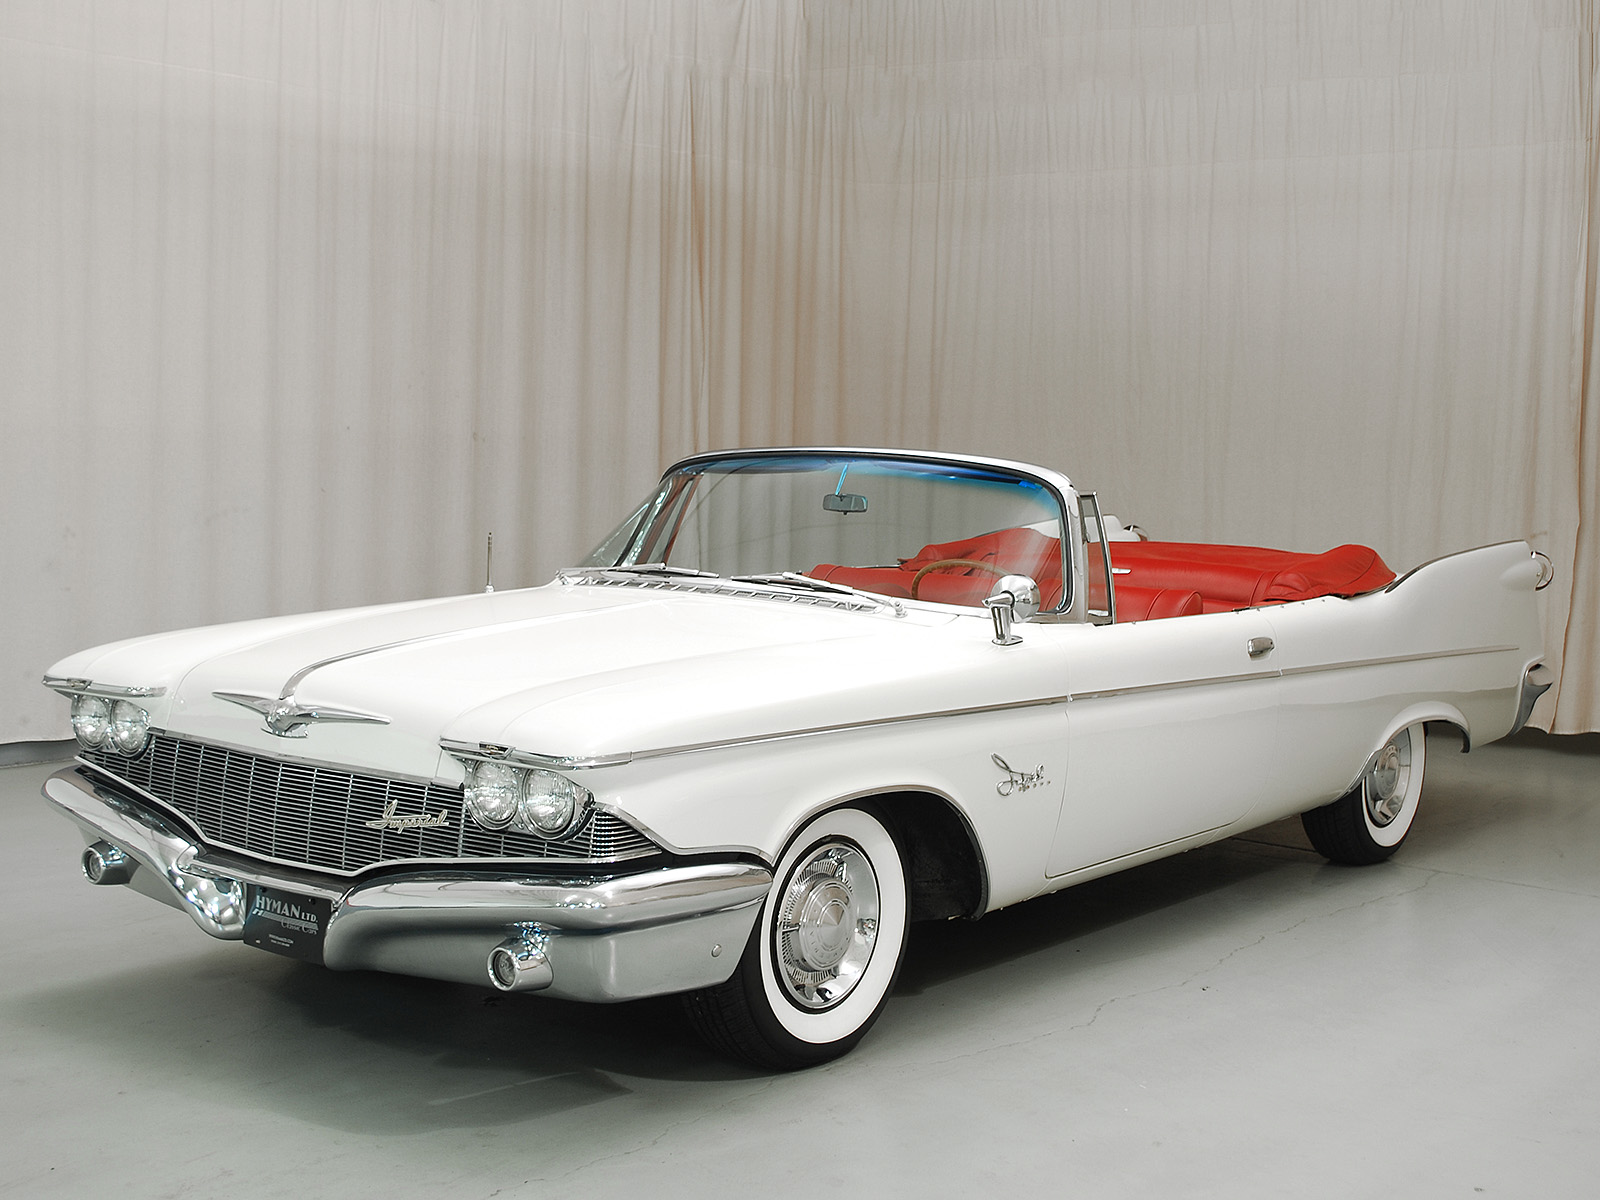 1960 Chrysler Imperial Crown Convertible Hyman Ltd